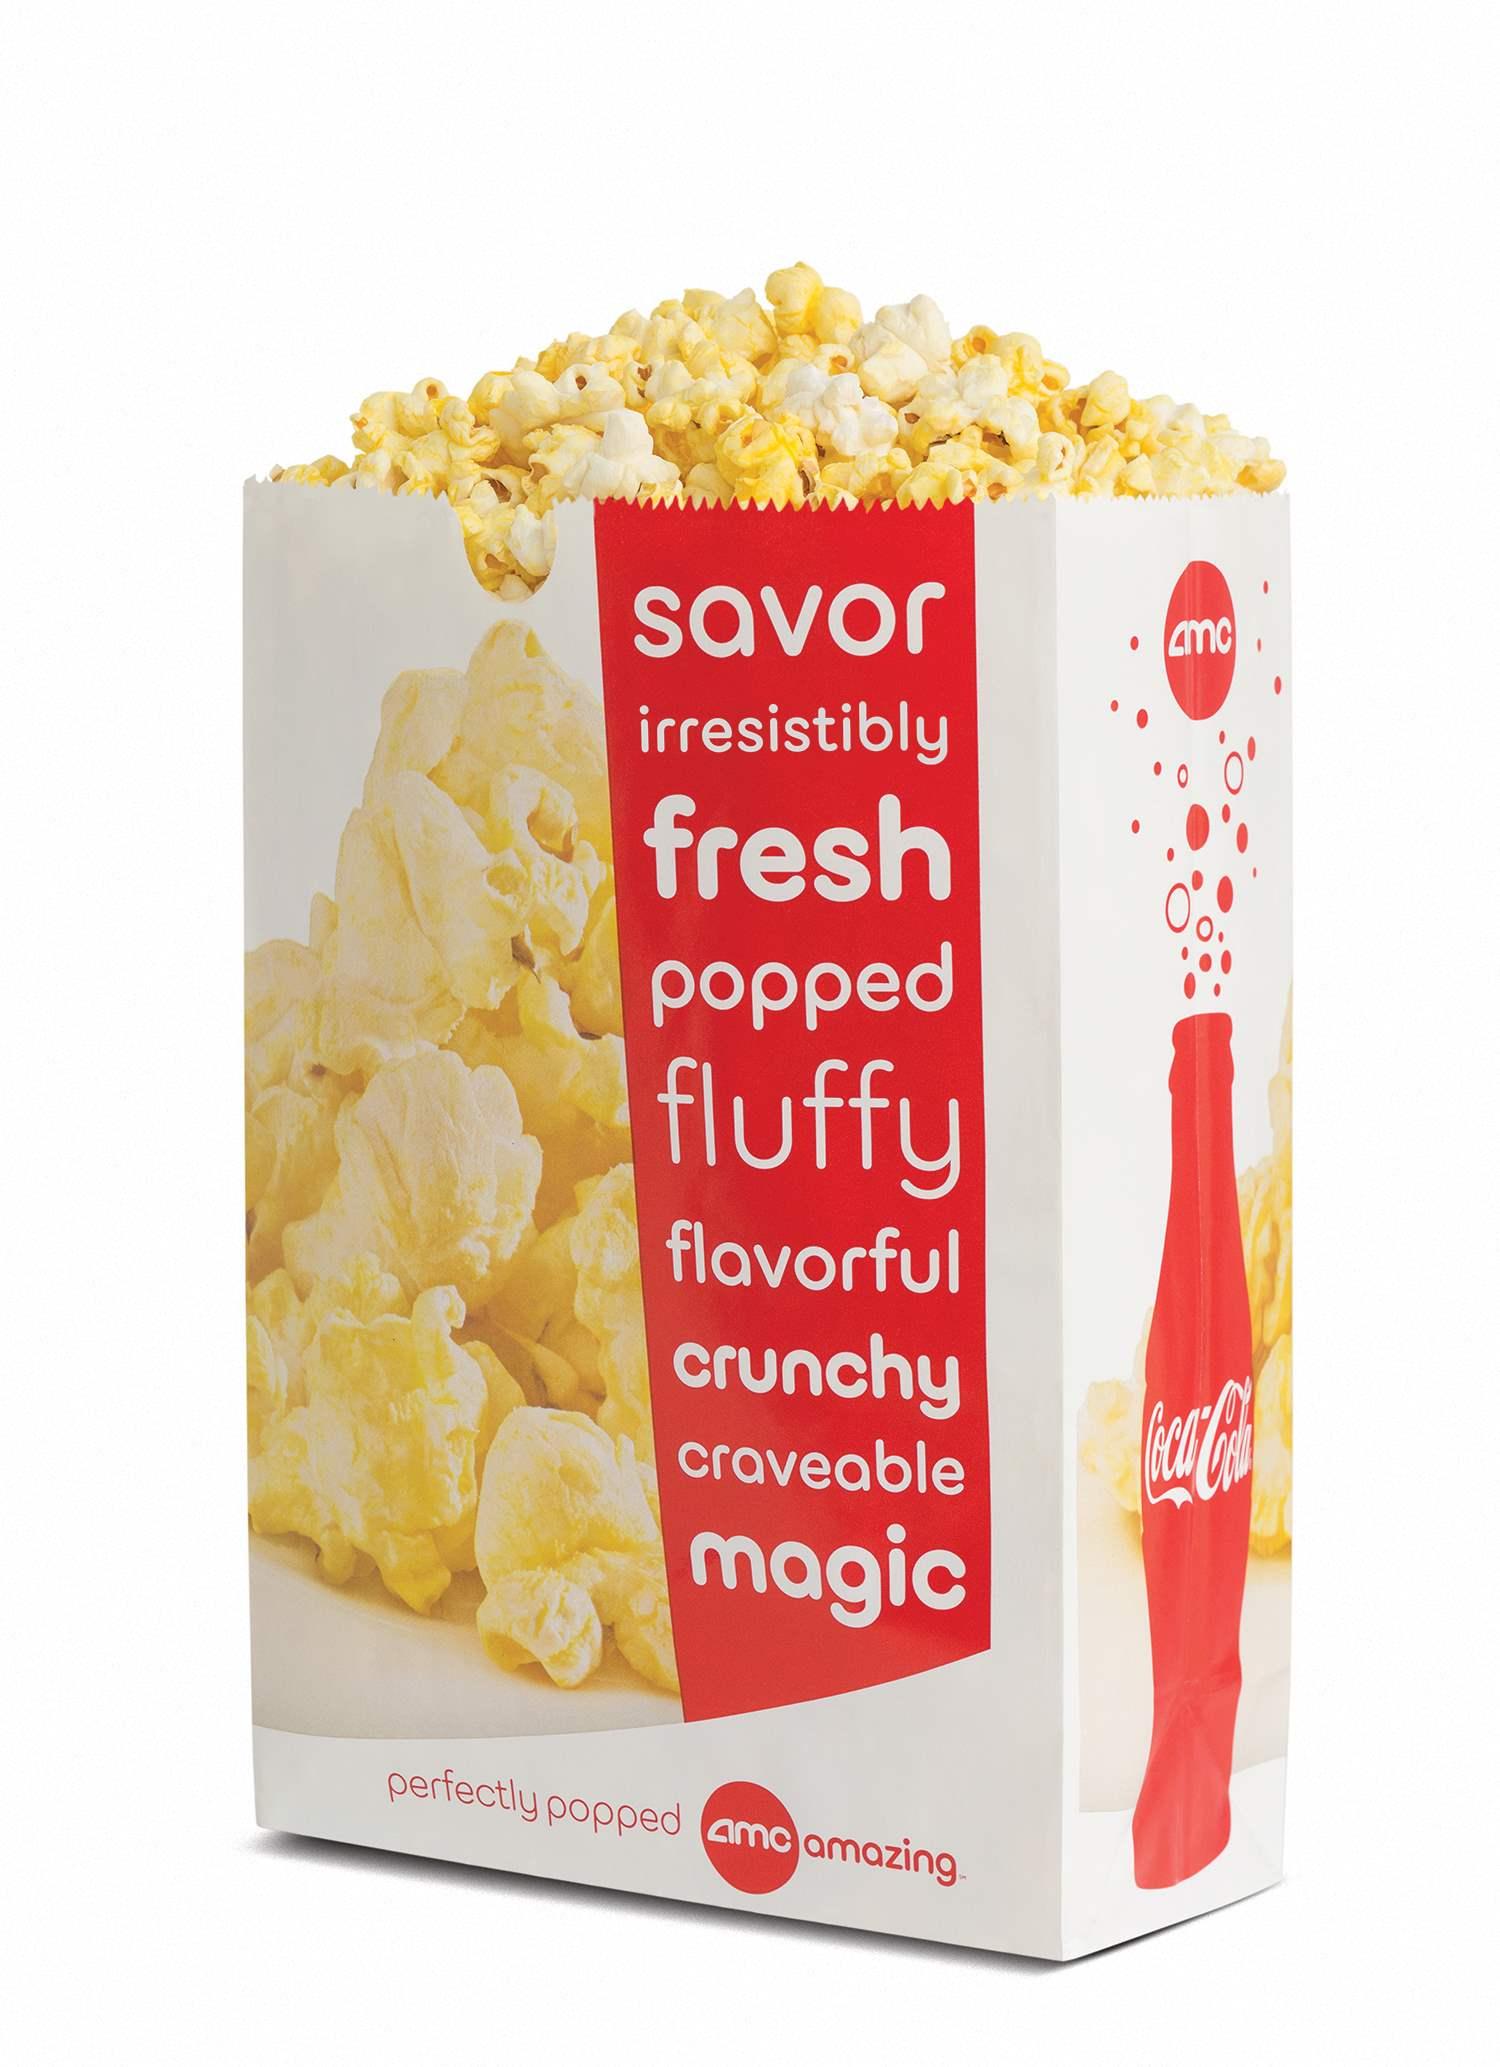 Free Large Popcorn This Sunday 7/31 at AMC Theatres